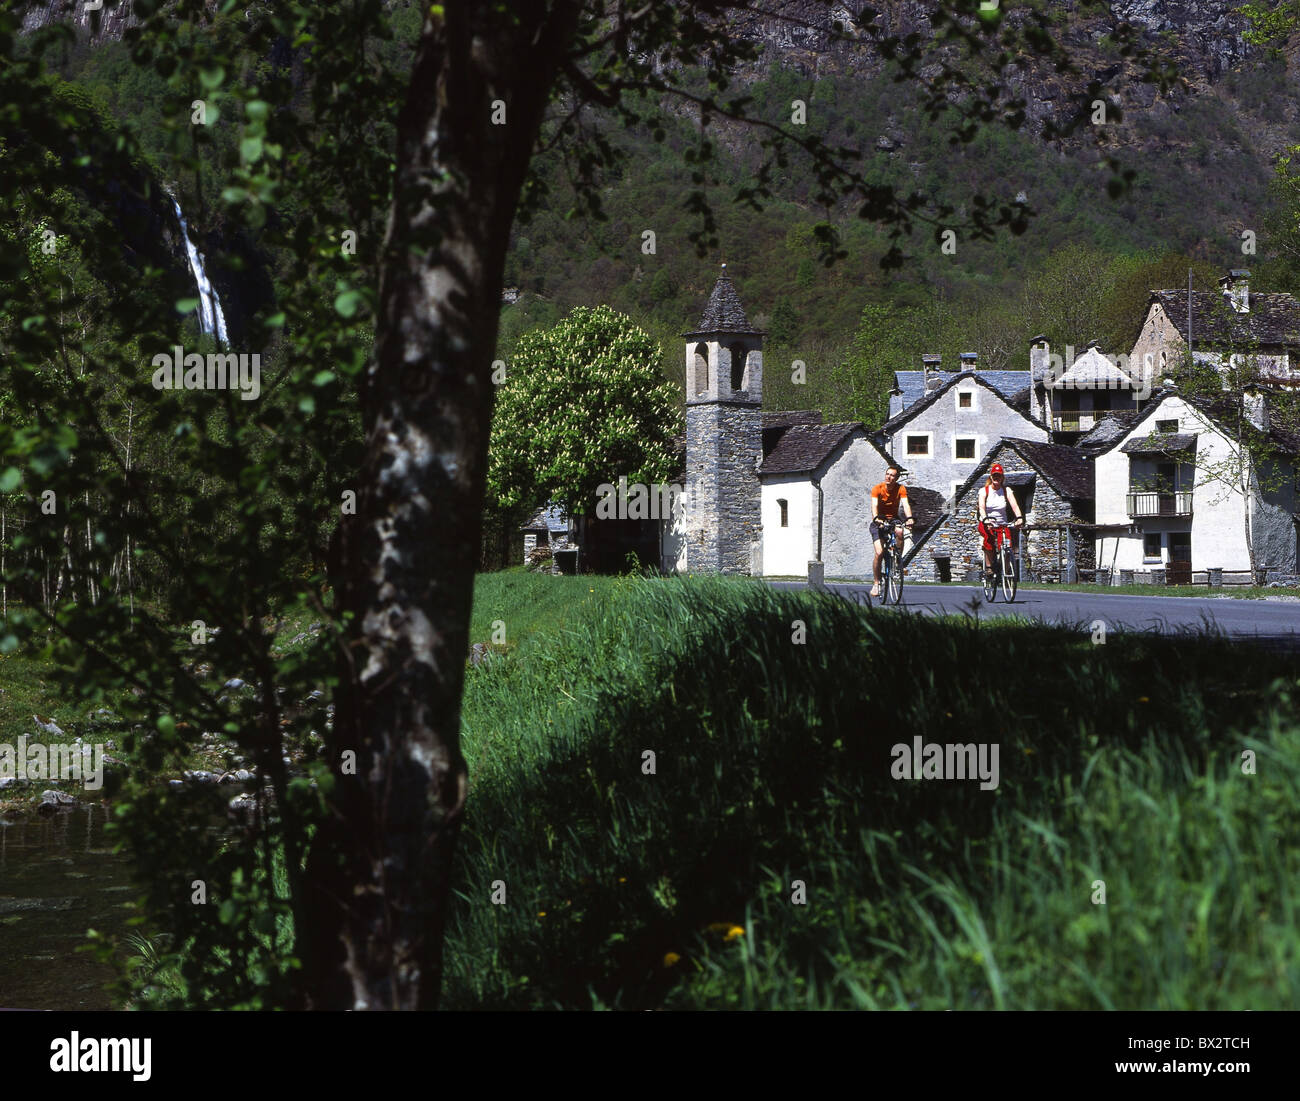 village Ritorto Val Bavona biking couple bicycle bike excursion Canton Ticino Switzerland Europe - Stock Image